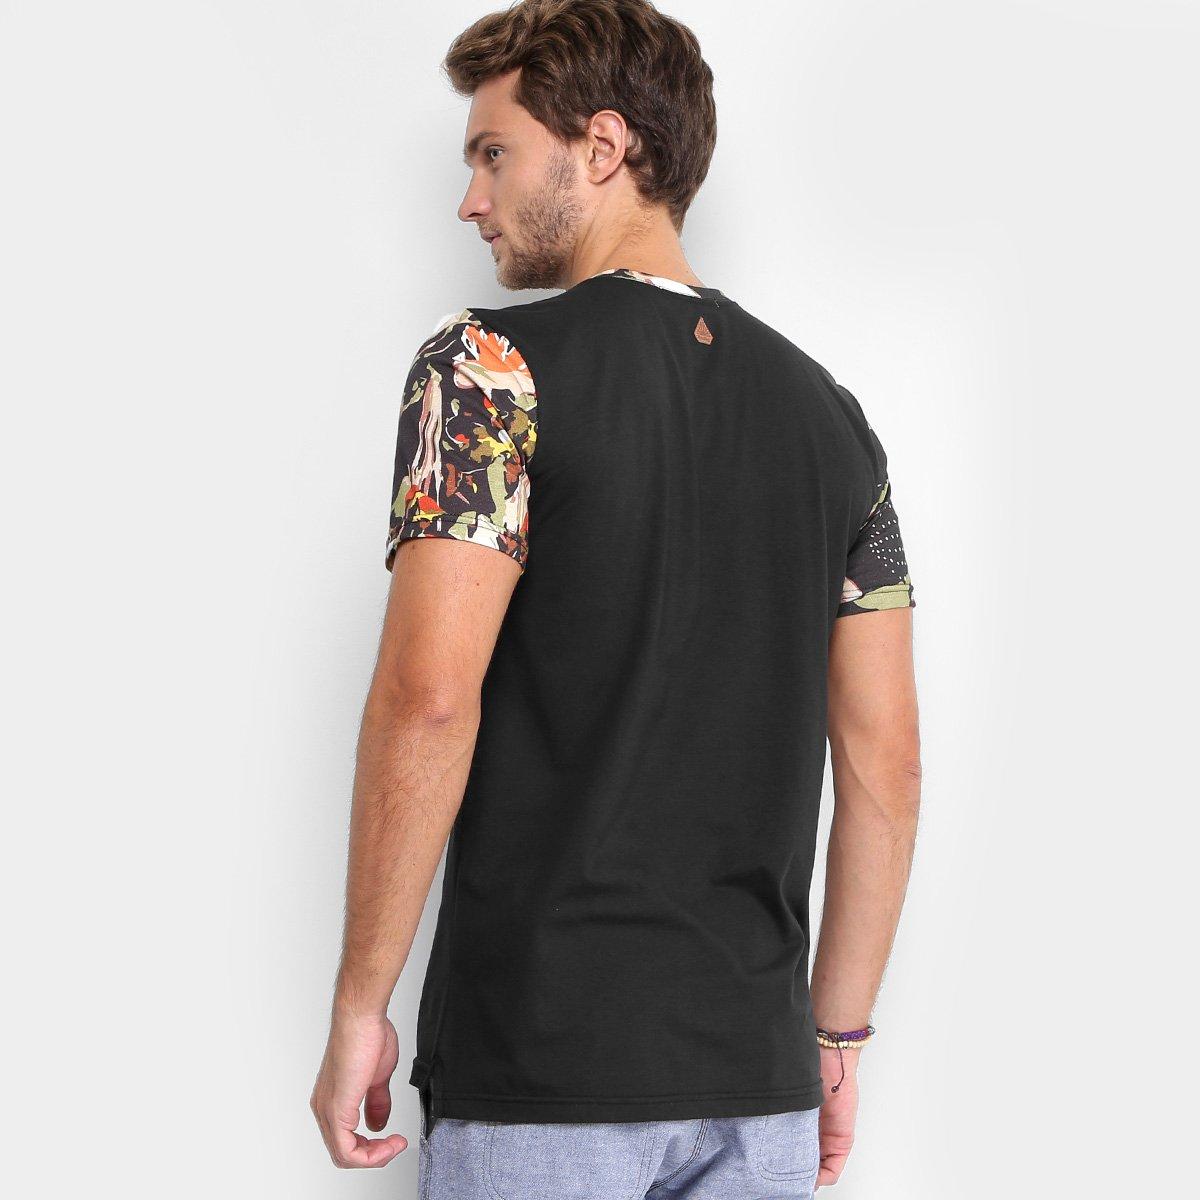 080a4c81f7 Camiseta Redley Gola Careca Bolso Estampada Masculina